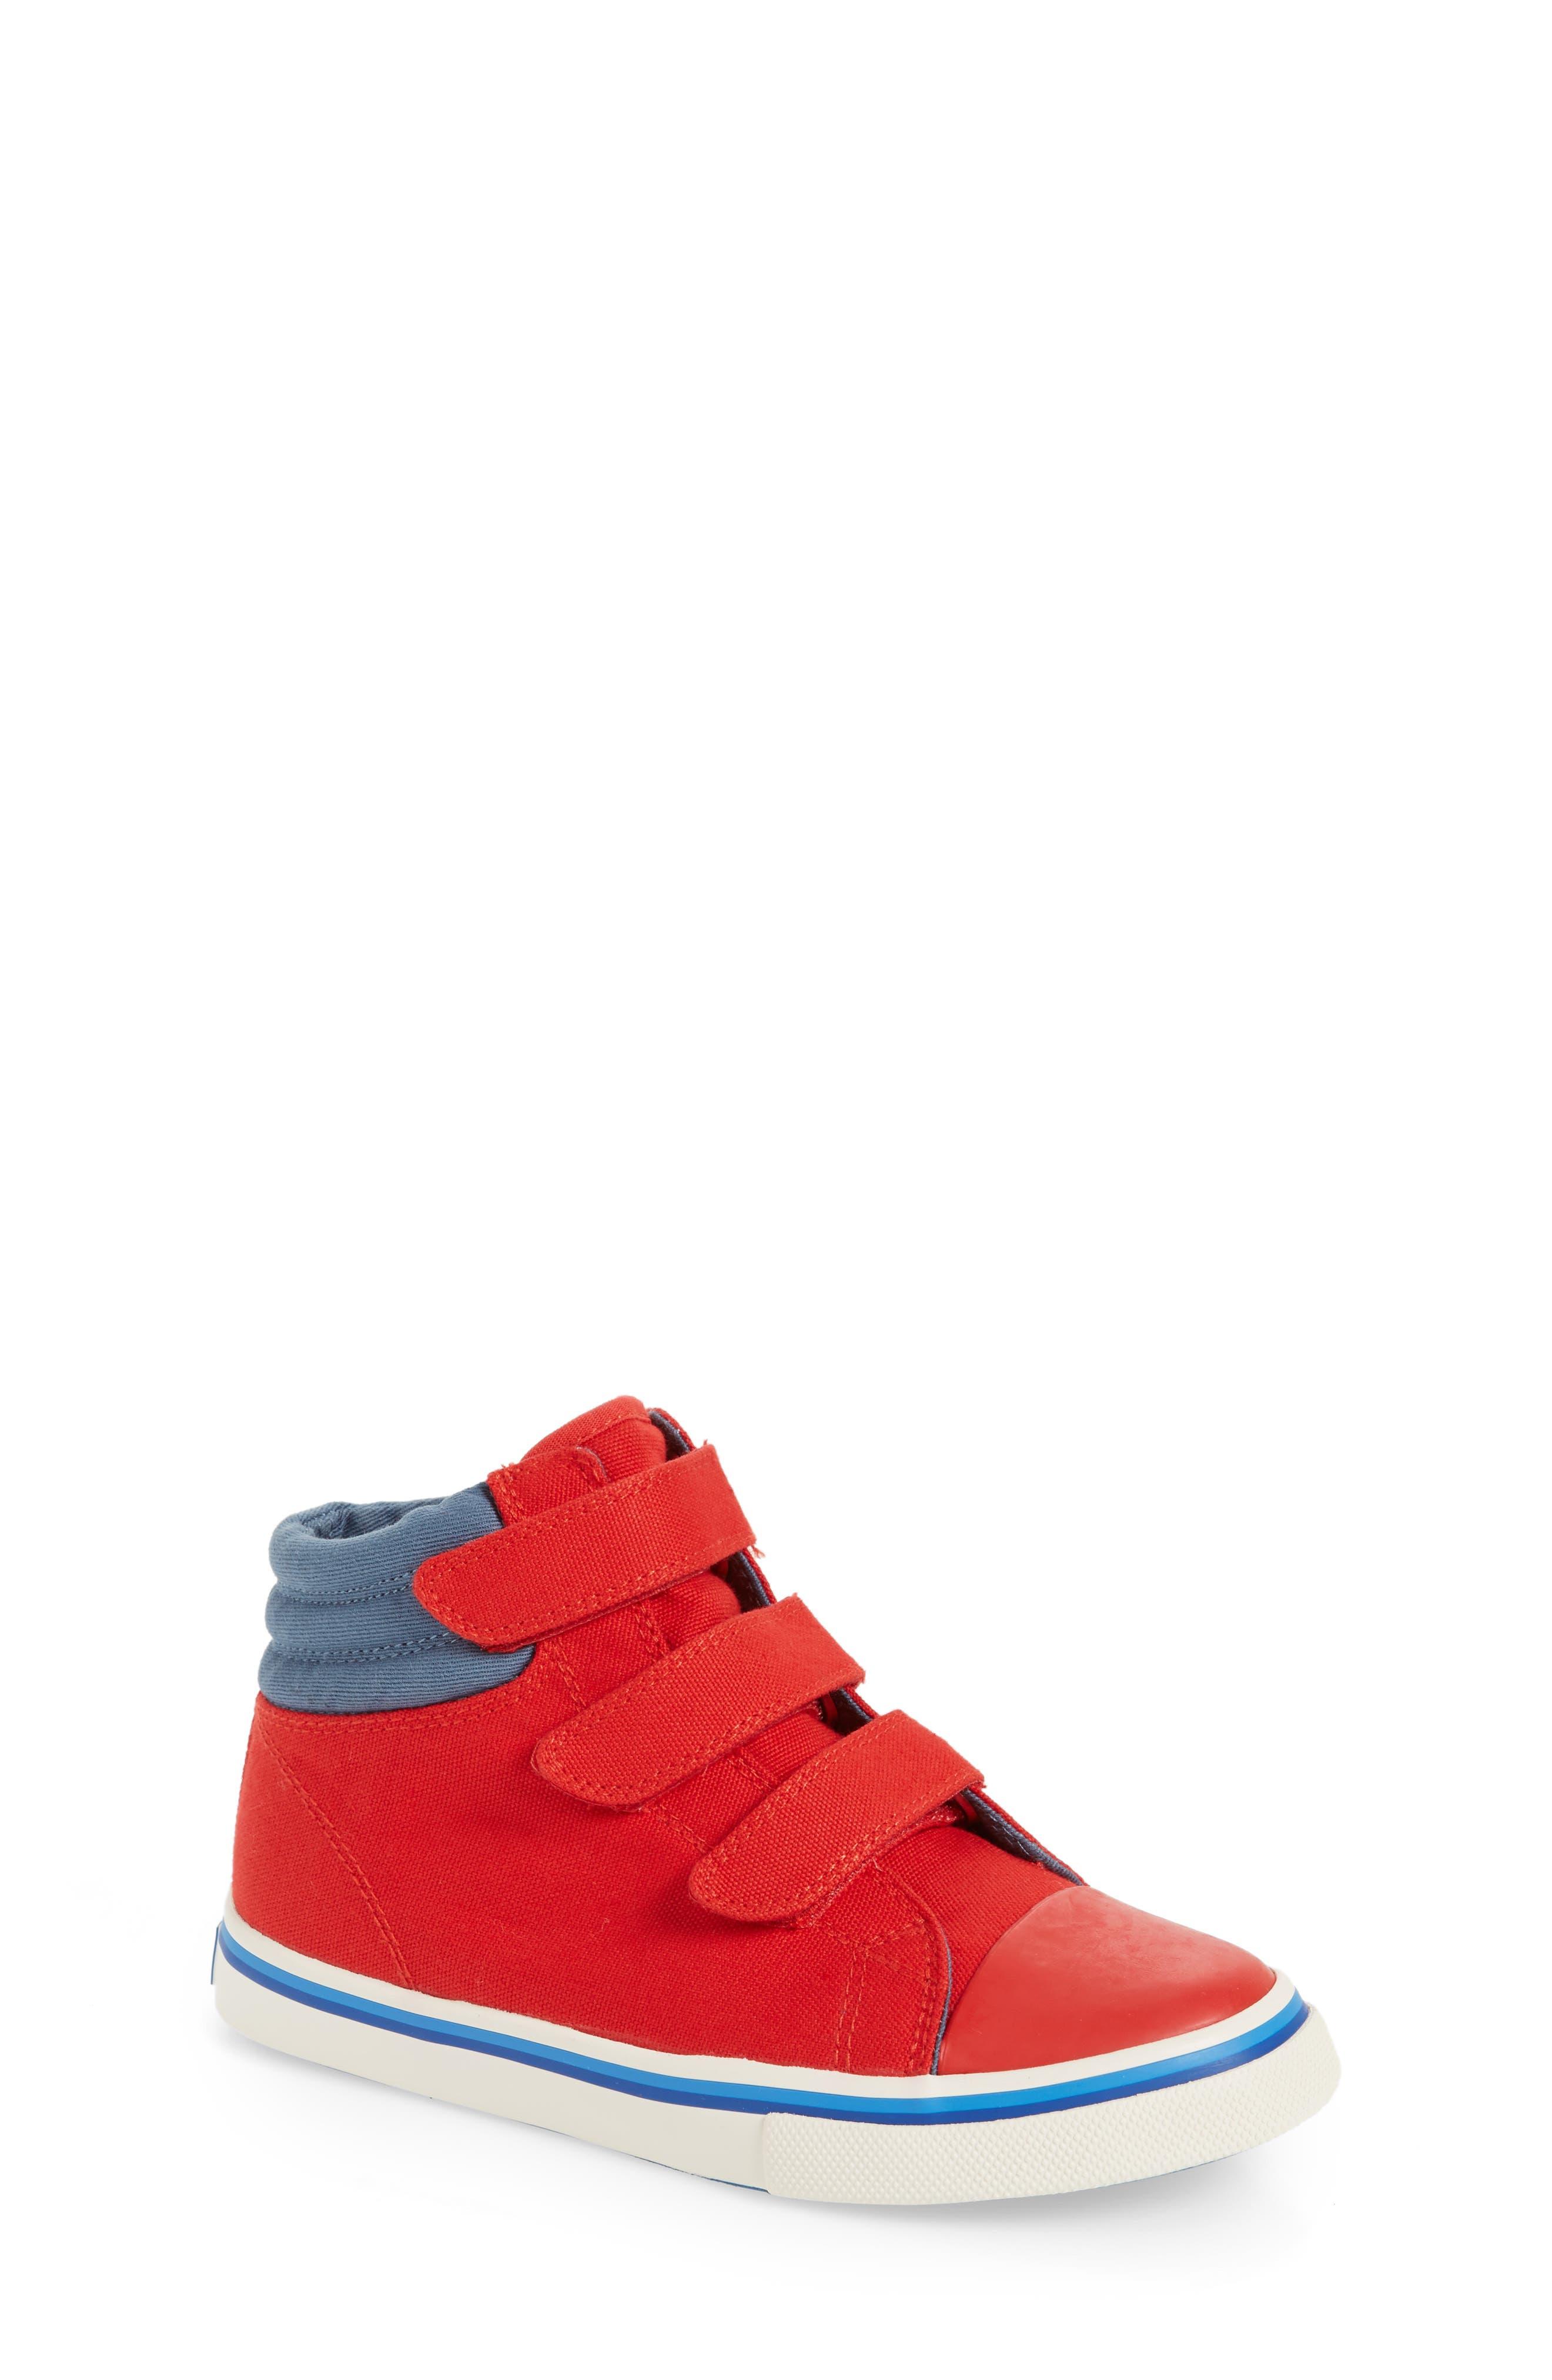 High Top Sneaker,                         Main,                         color, 614